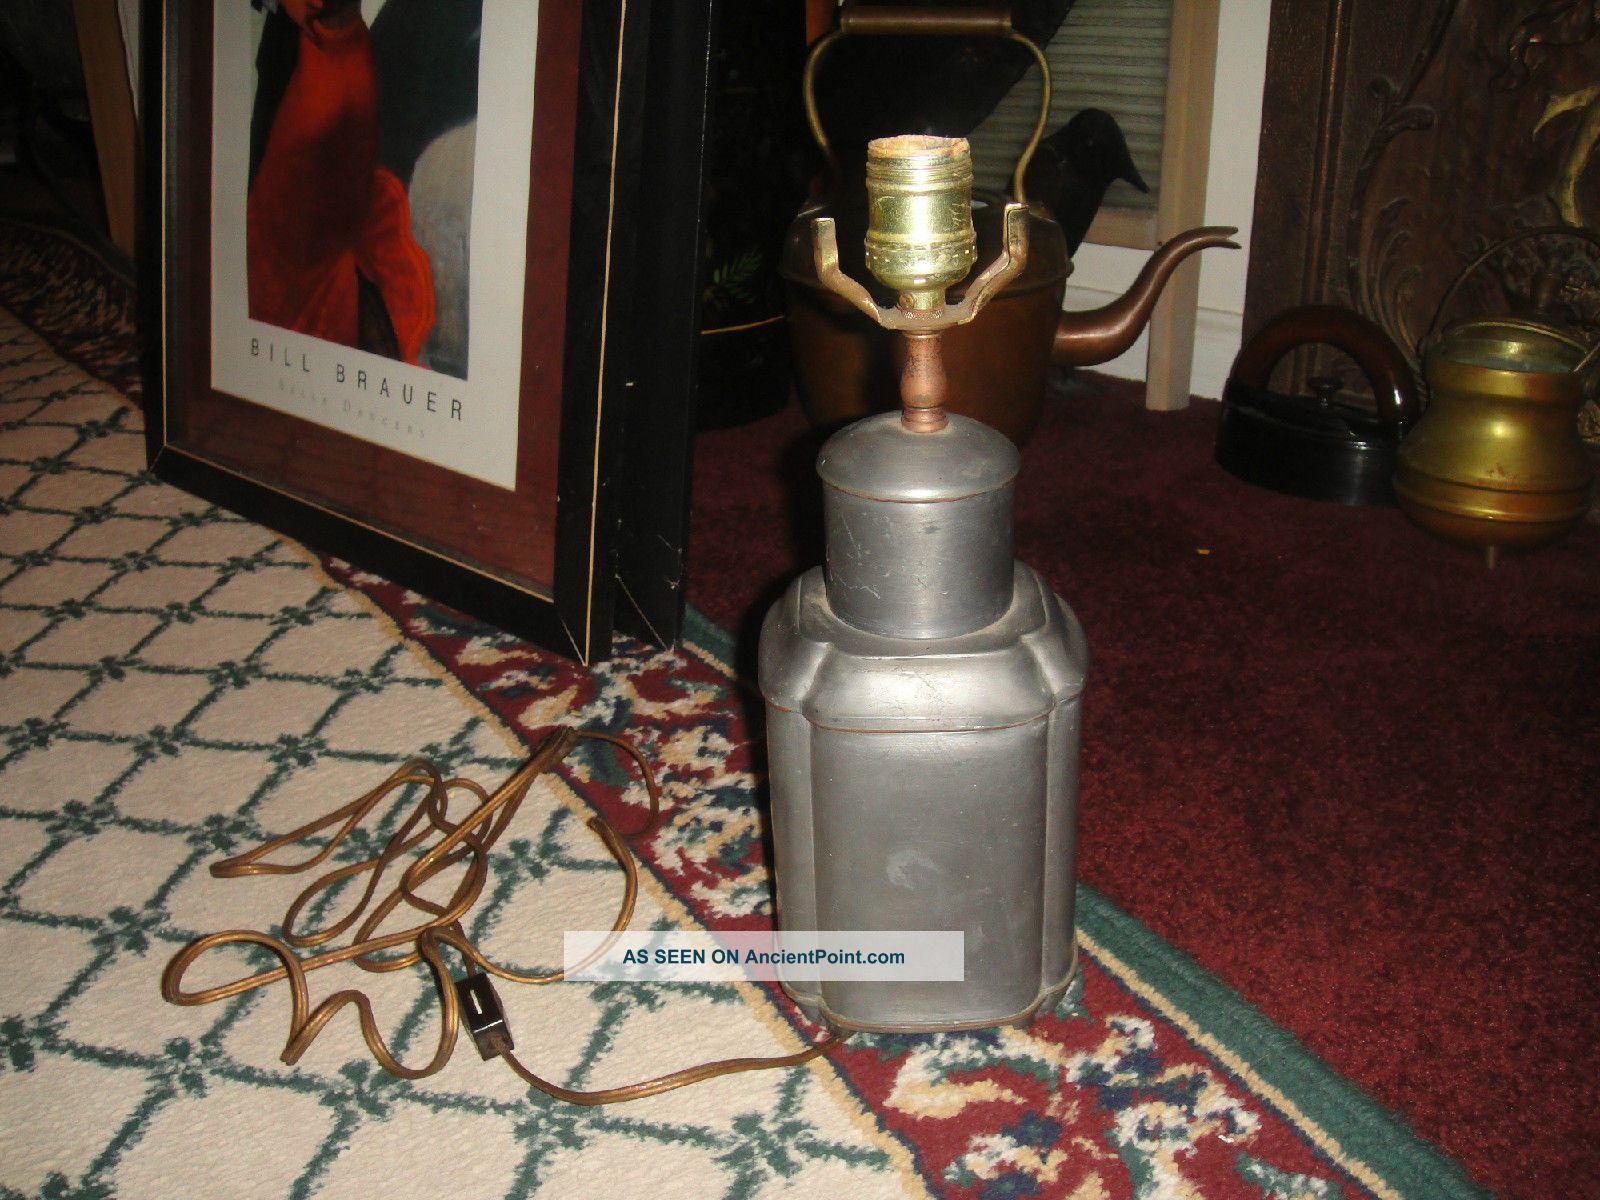 Vintage Hong Kong Industrial Tin Metal Table Lamp - Square Body - Lqqk Lamps photo